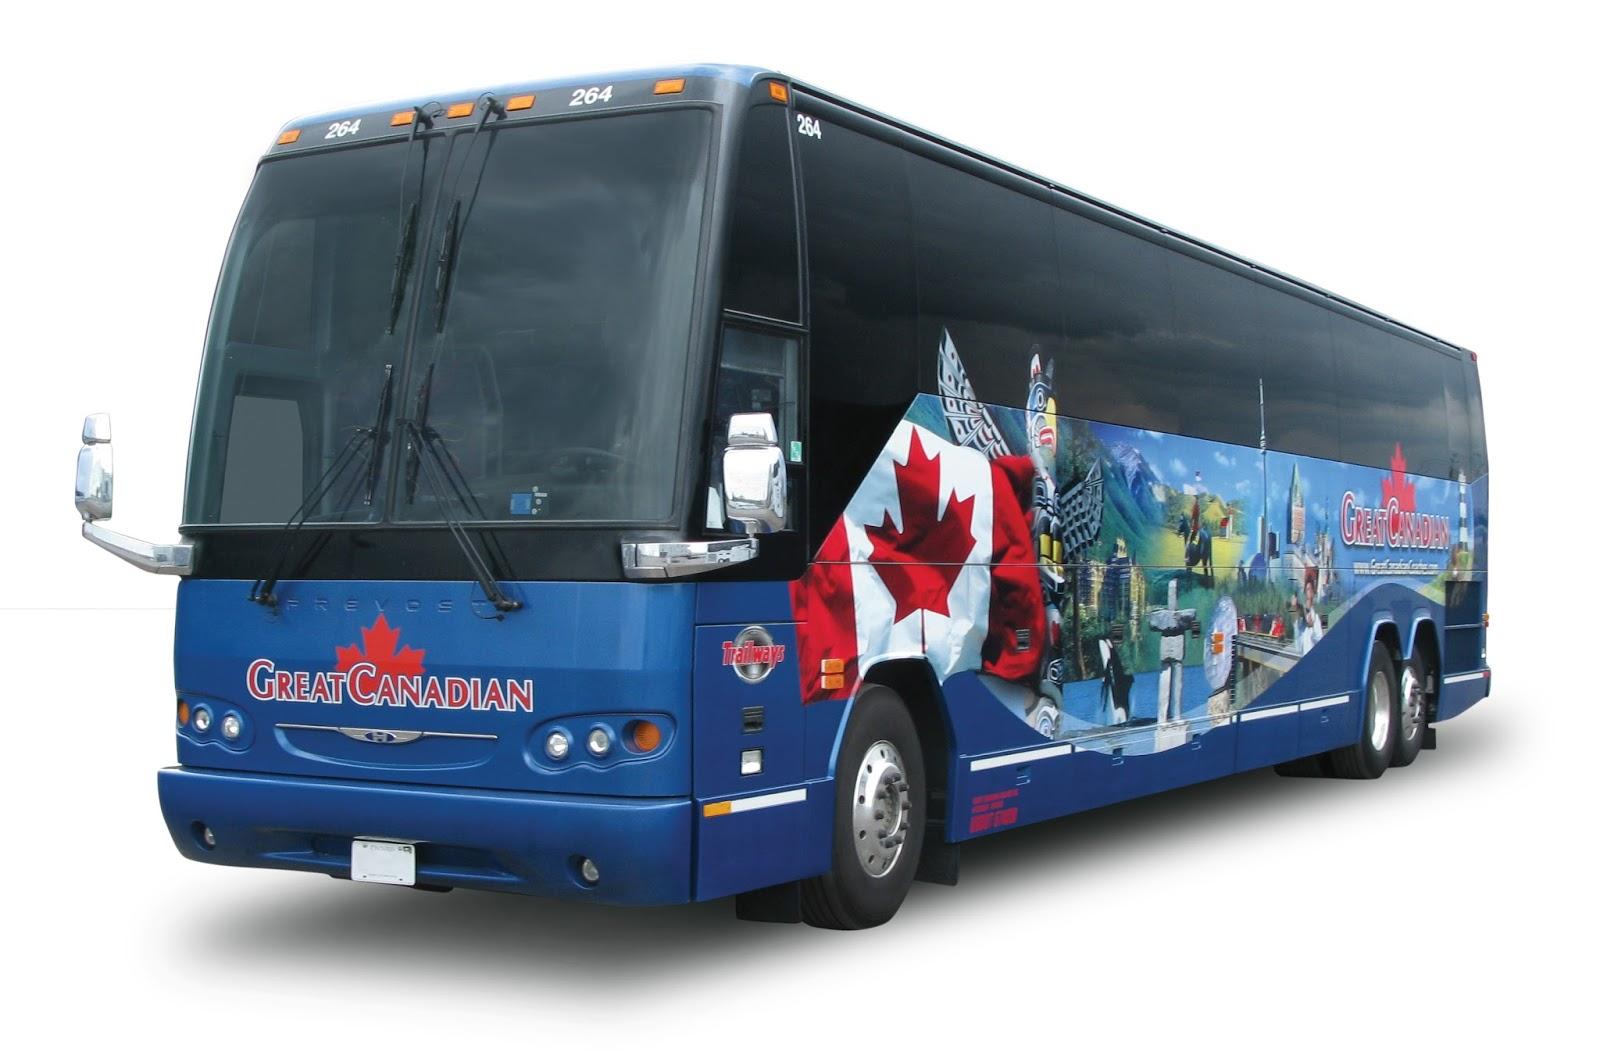 Gambar Transportasi Alat Transportasi Darat Bus